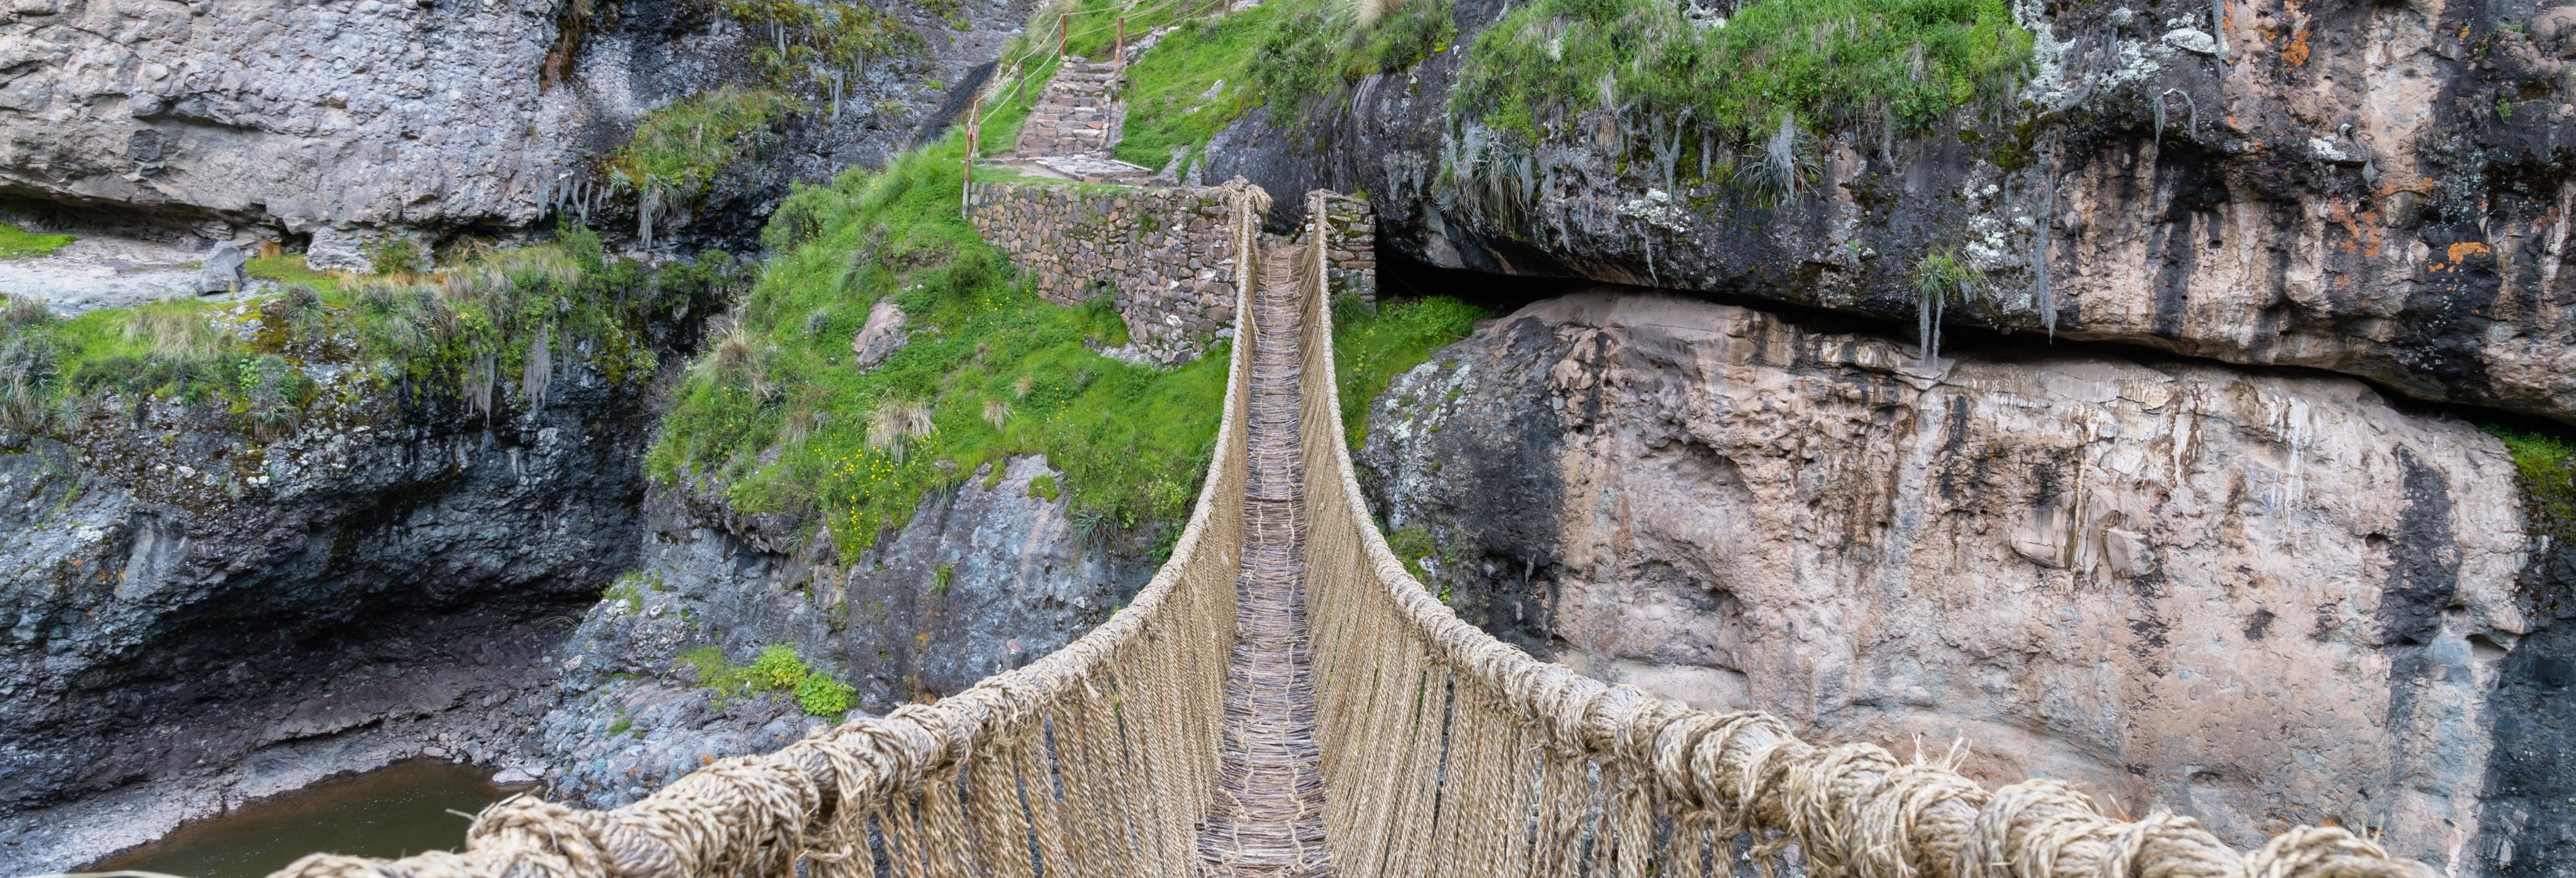 Excursion au pont Inca de Q'eswachaka